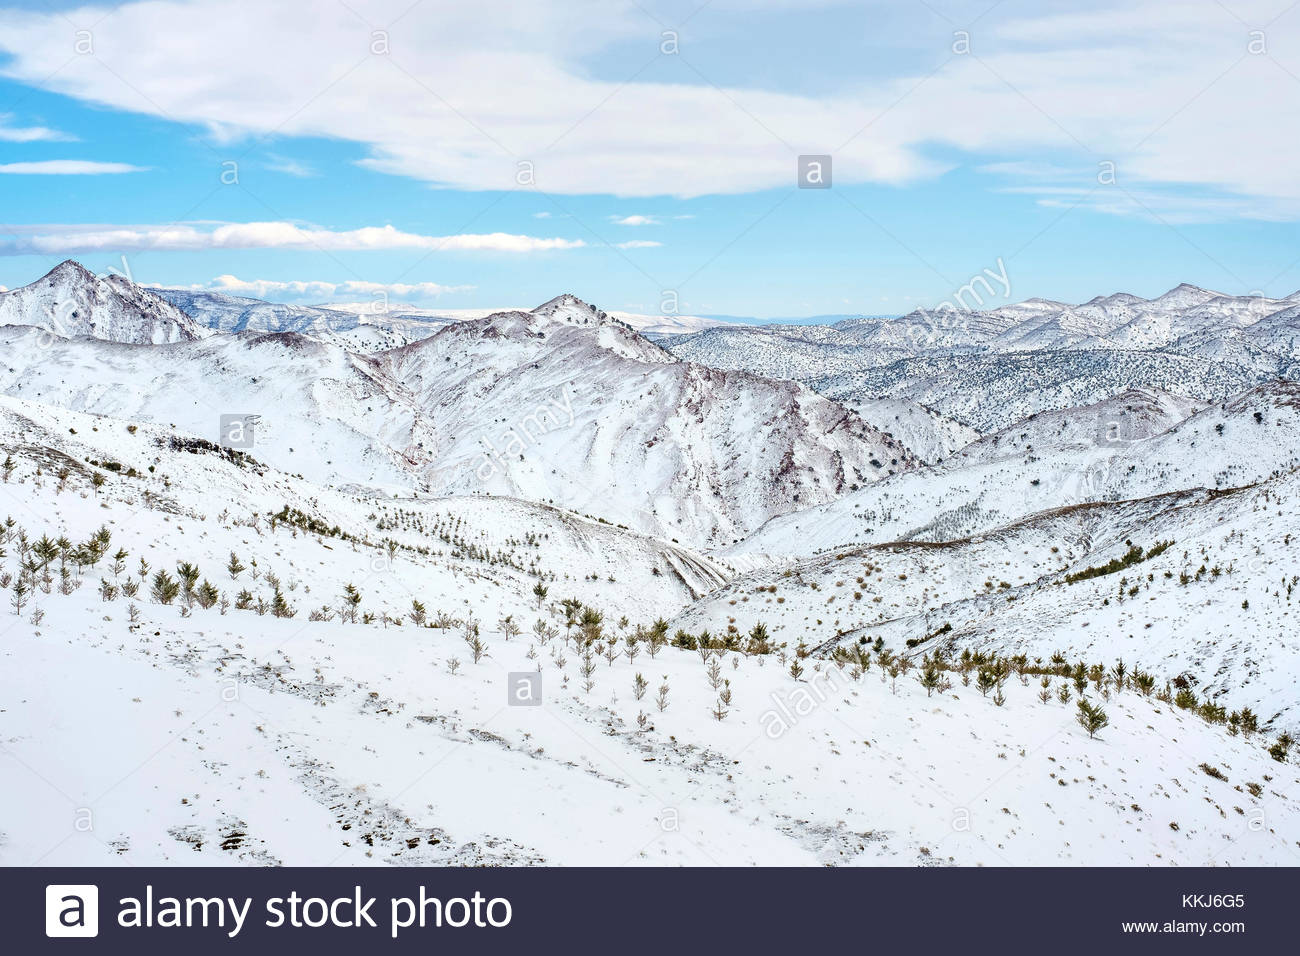 Morocco, Marrakech-Safi (Marrakesh-Tensift-El Haouz), Al Haouz Province. Tizi N'Tichka pass in the Atlas Mountains - Stock Image